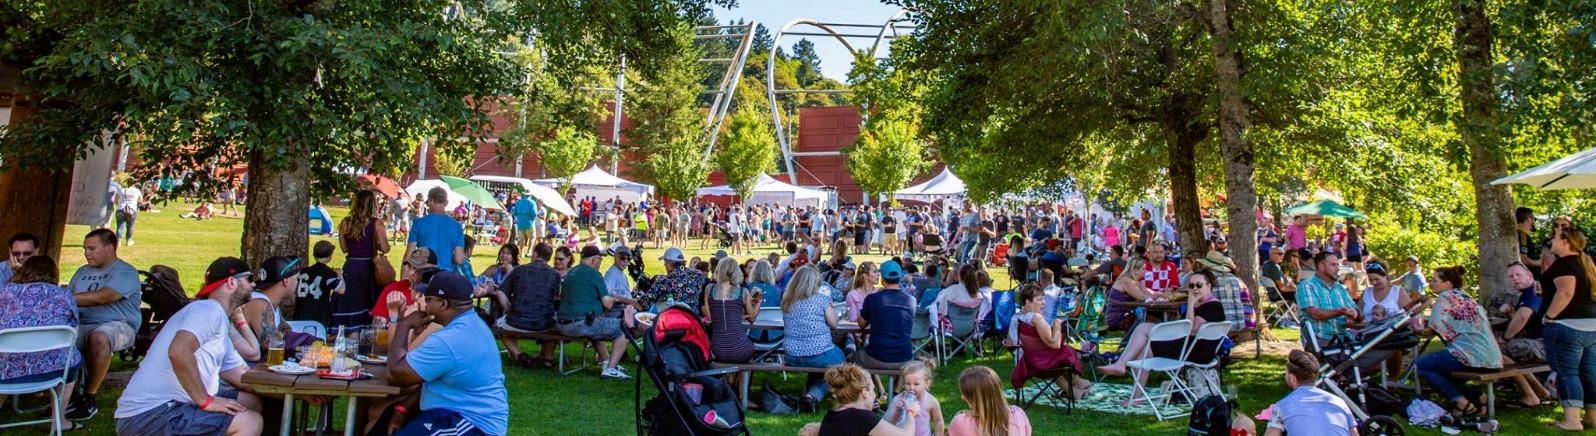 Oregon Trail Brewfest outdoor beer festival